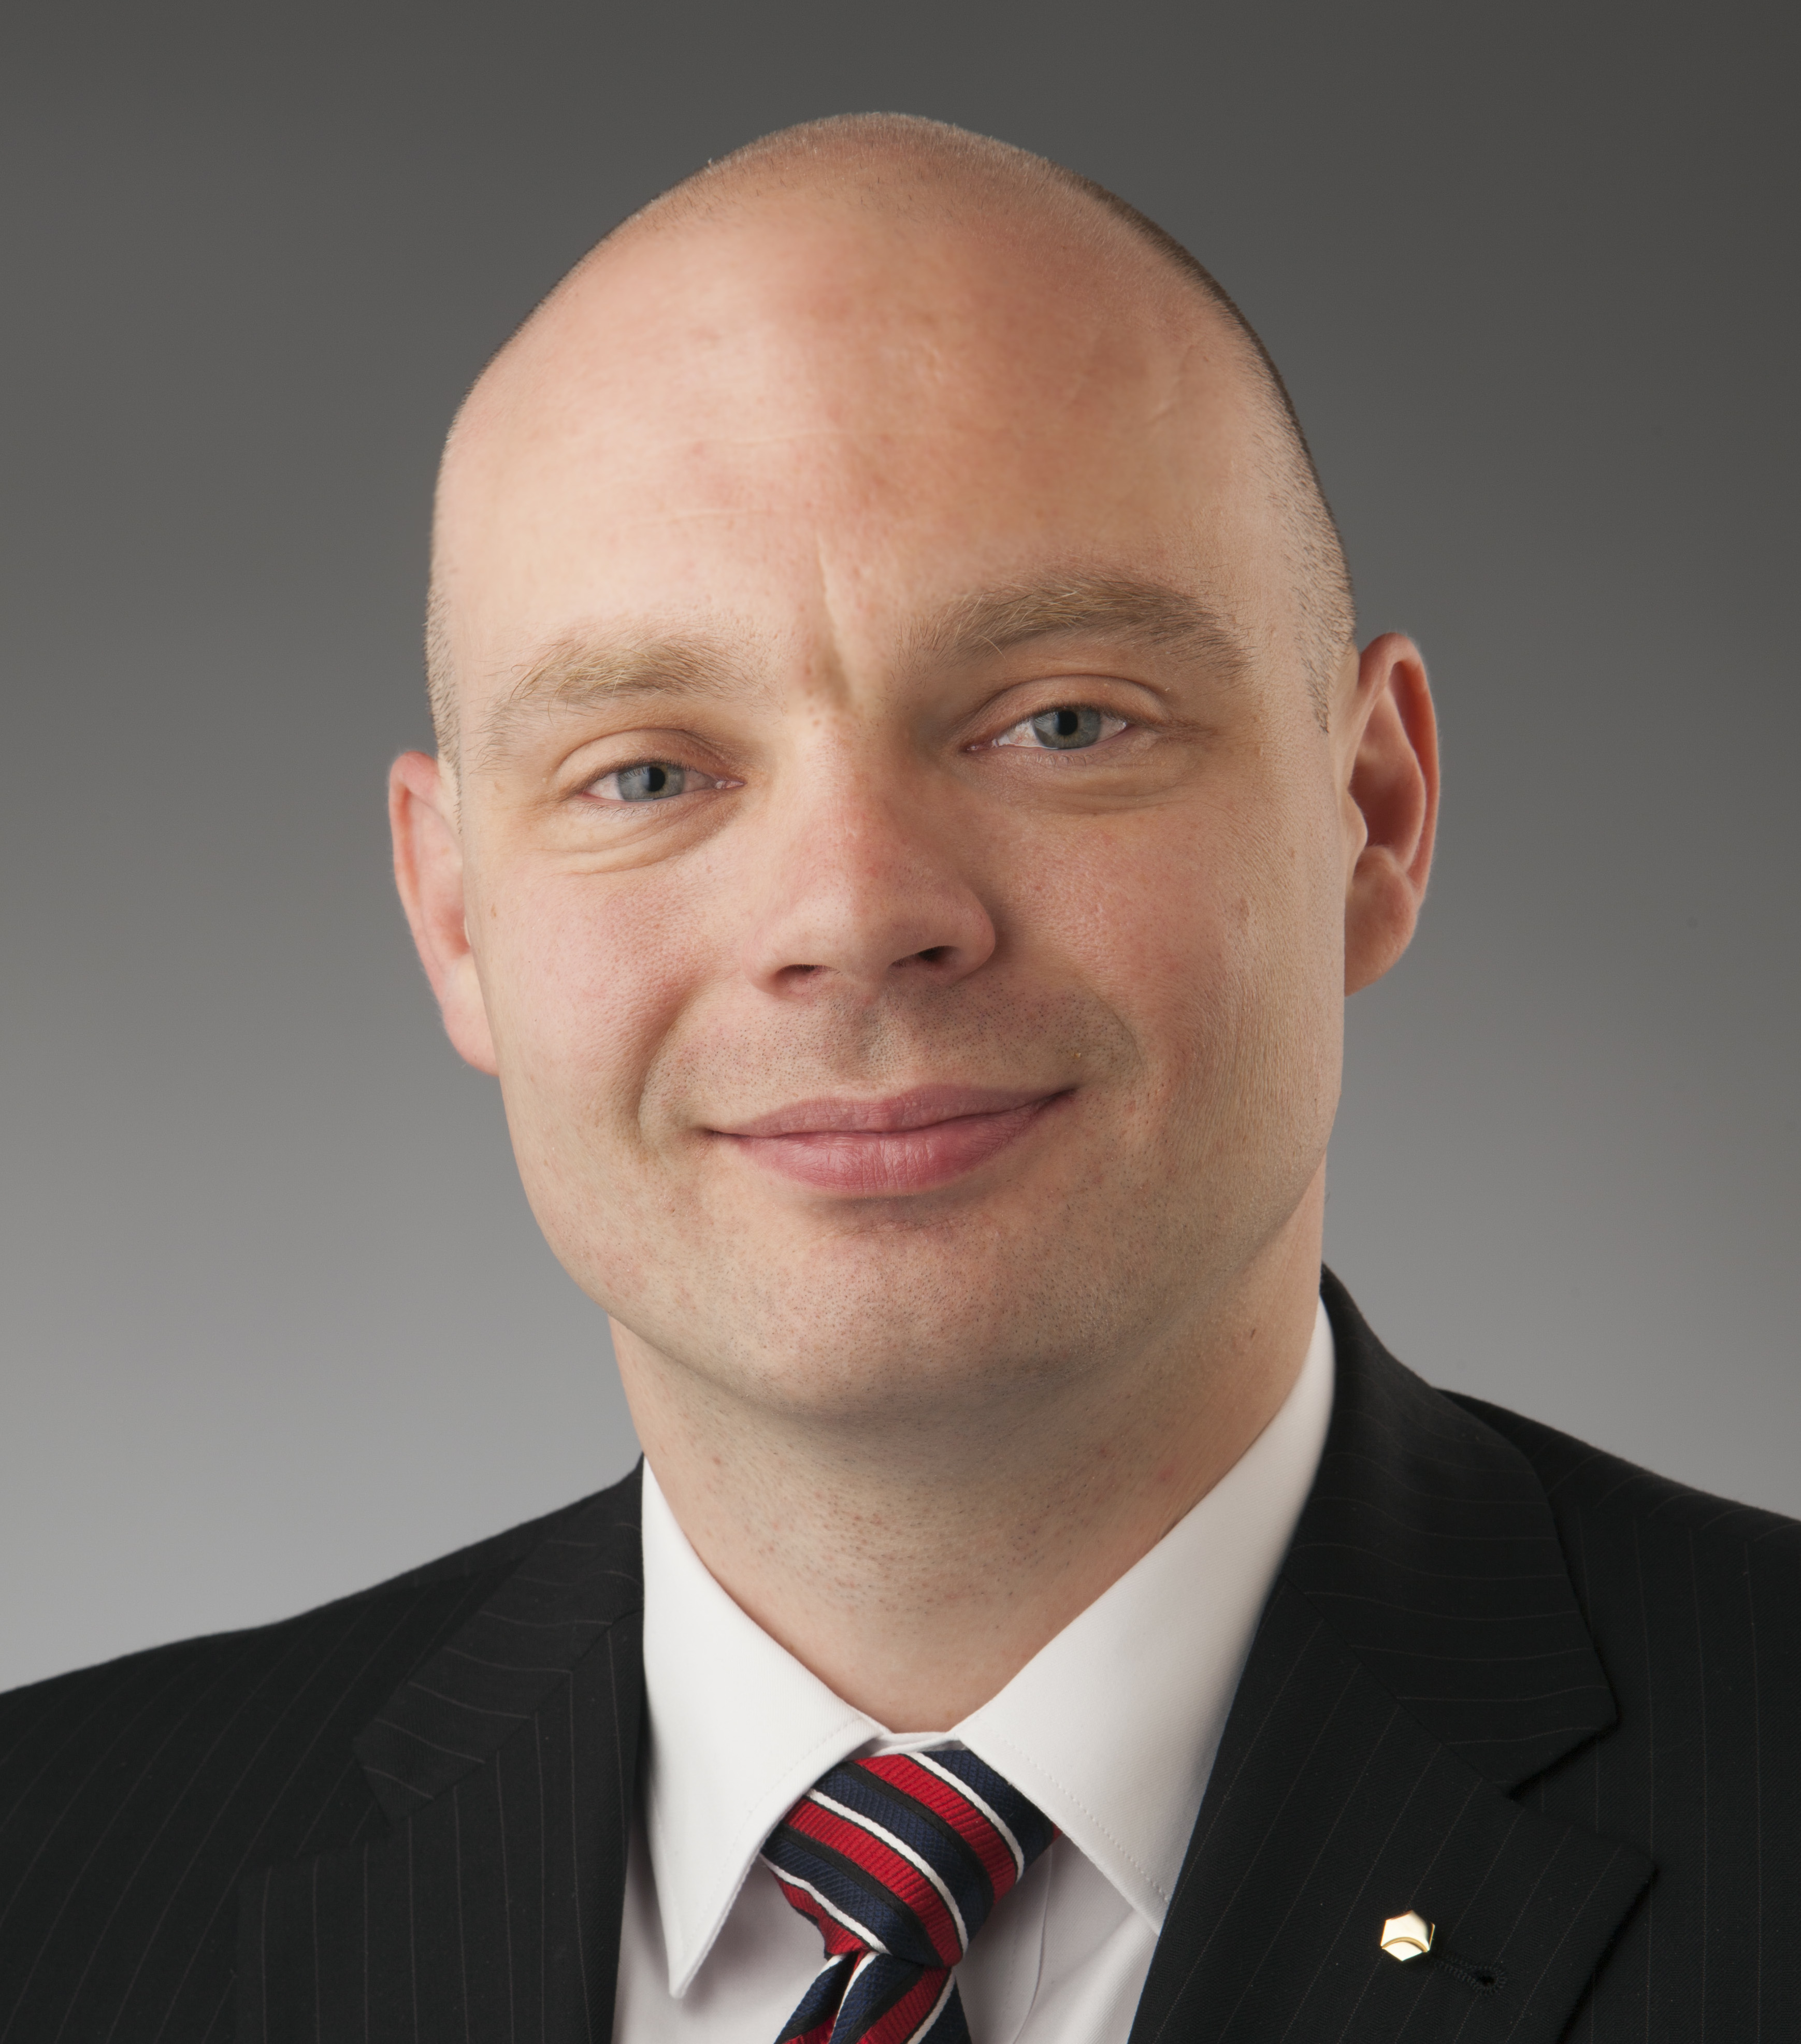 Dr Cristian Birzer